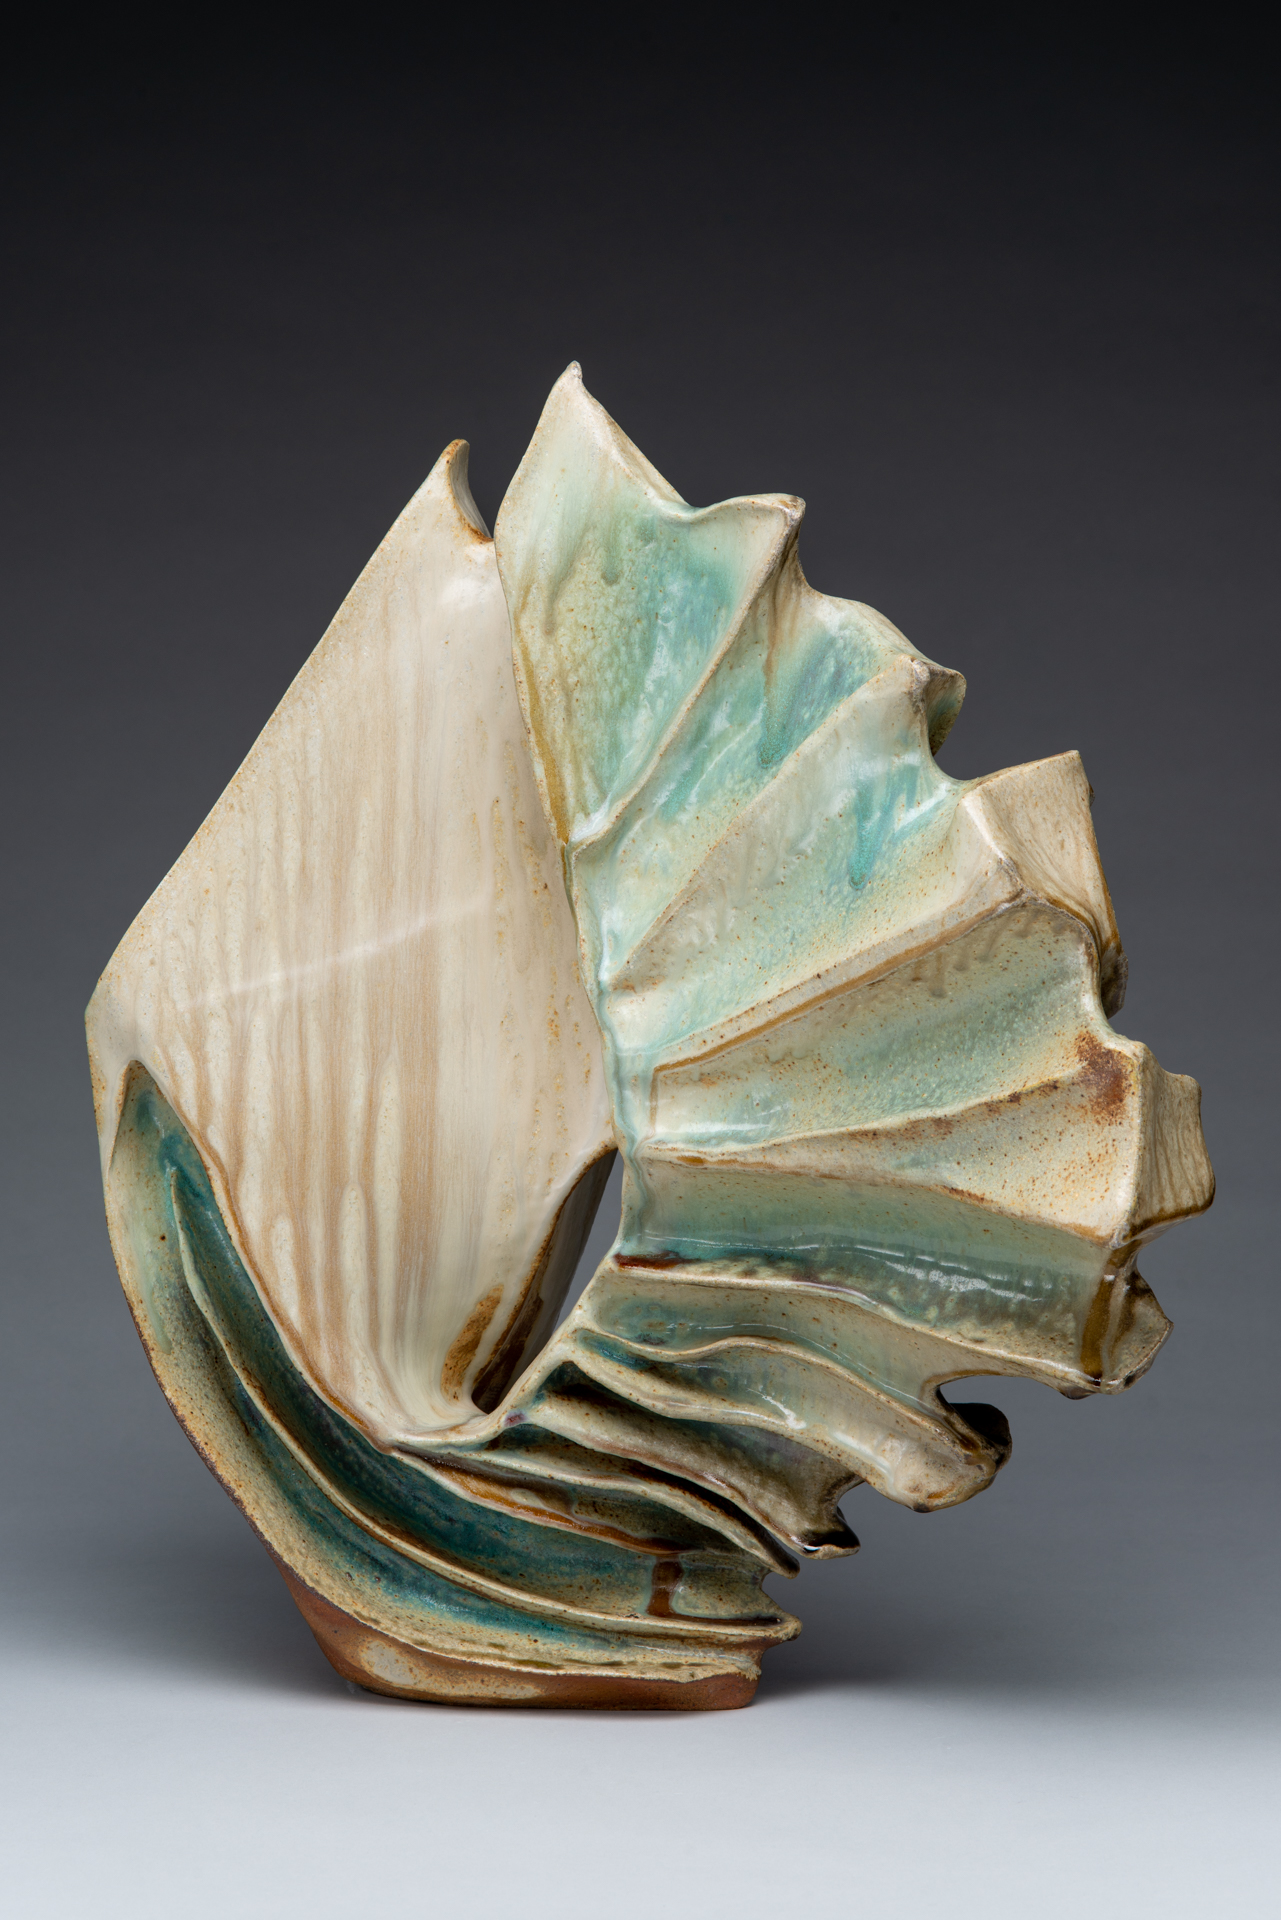 "Essence II , Ceramic. Handbuilt from stoneware clay, sprayed glaze, wood fired to cone 10 in Noborigama kiln. 22"" h x 20""w x 8""d. 2018."